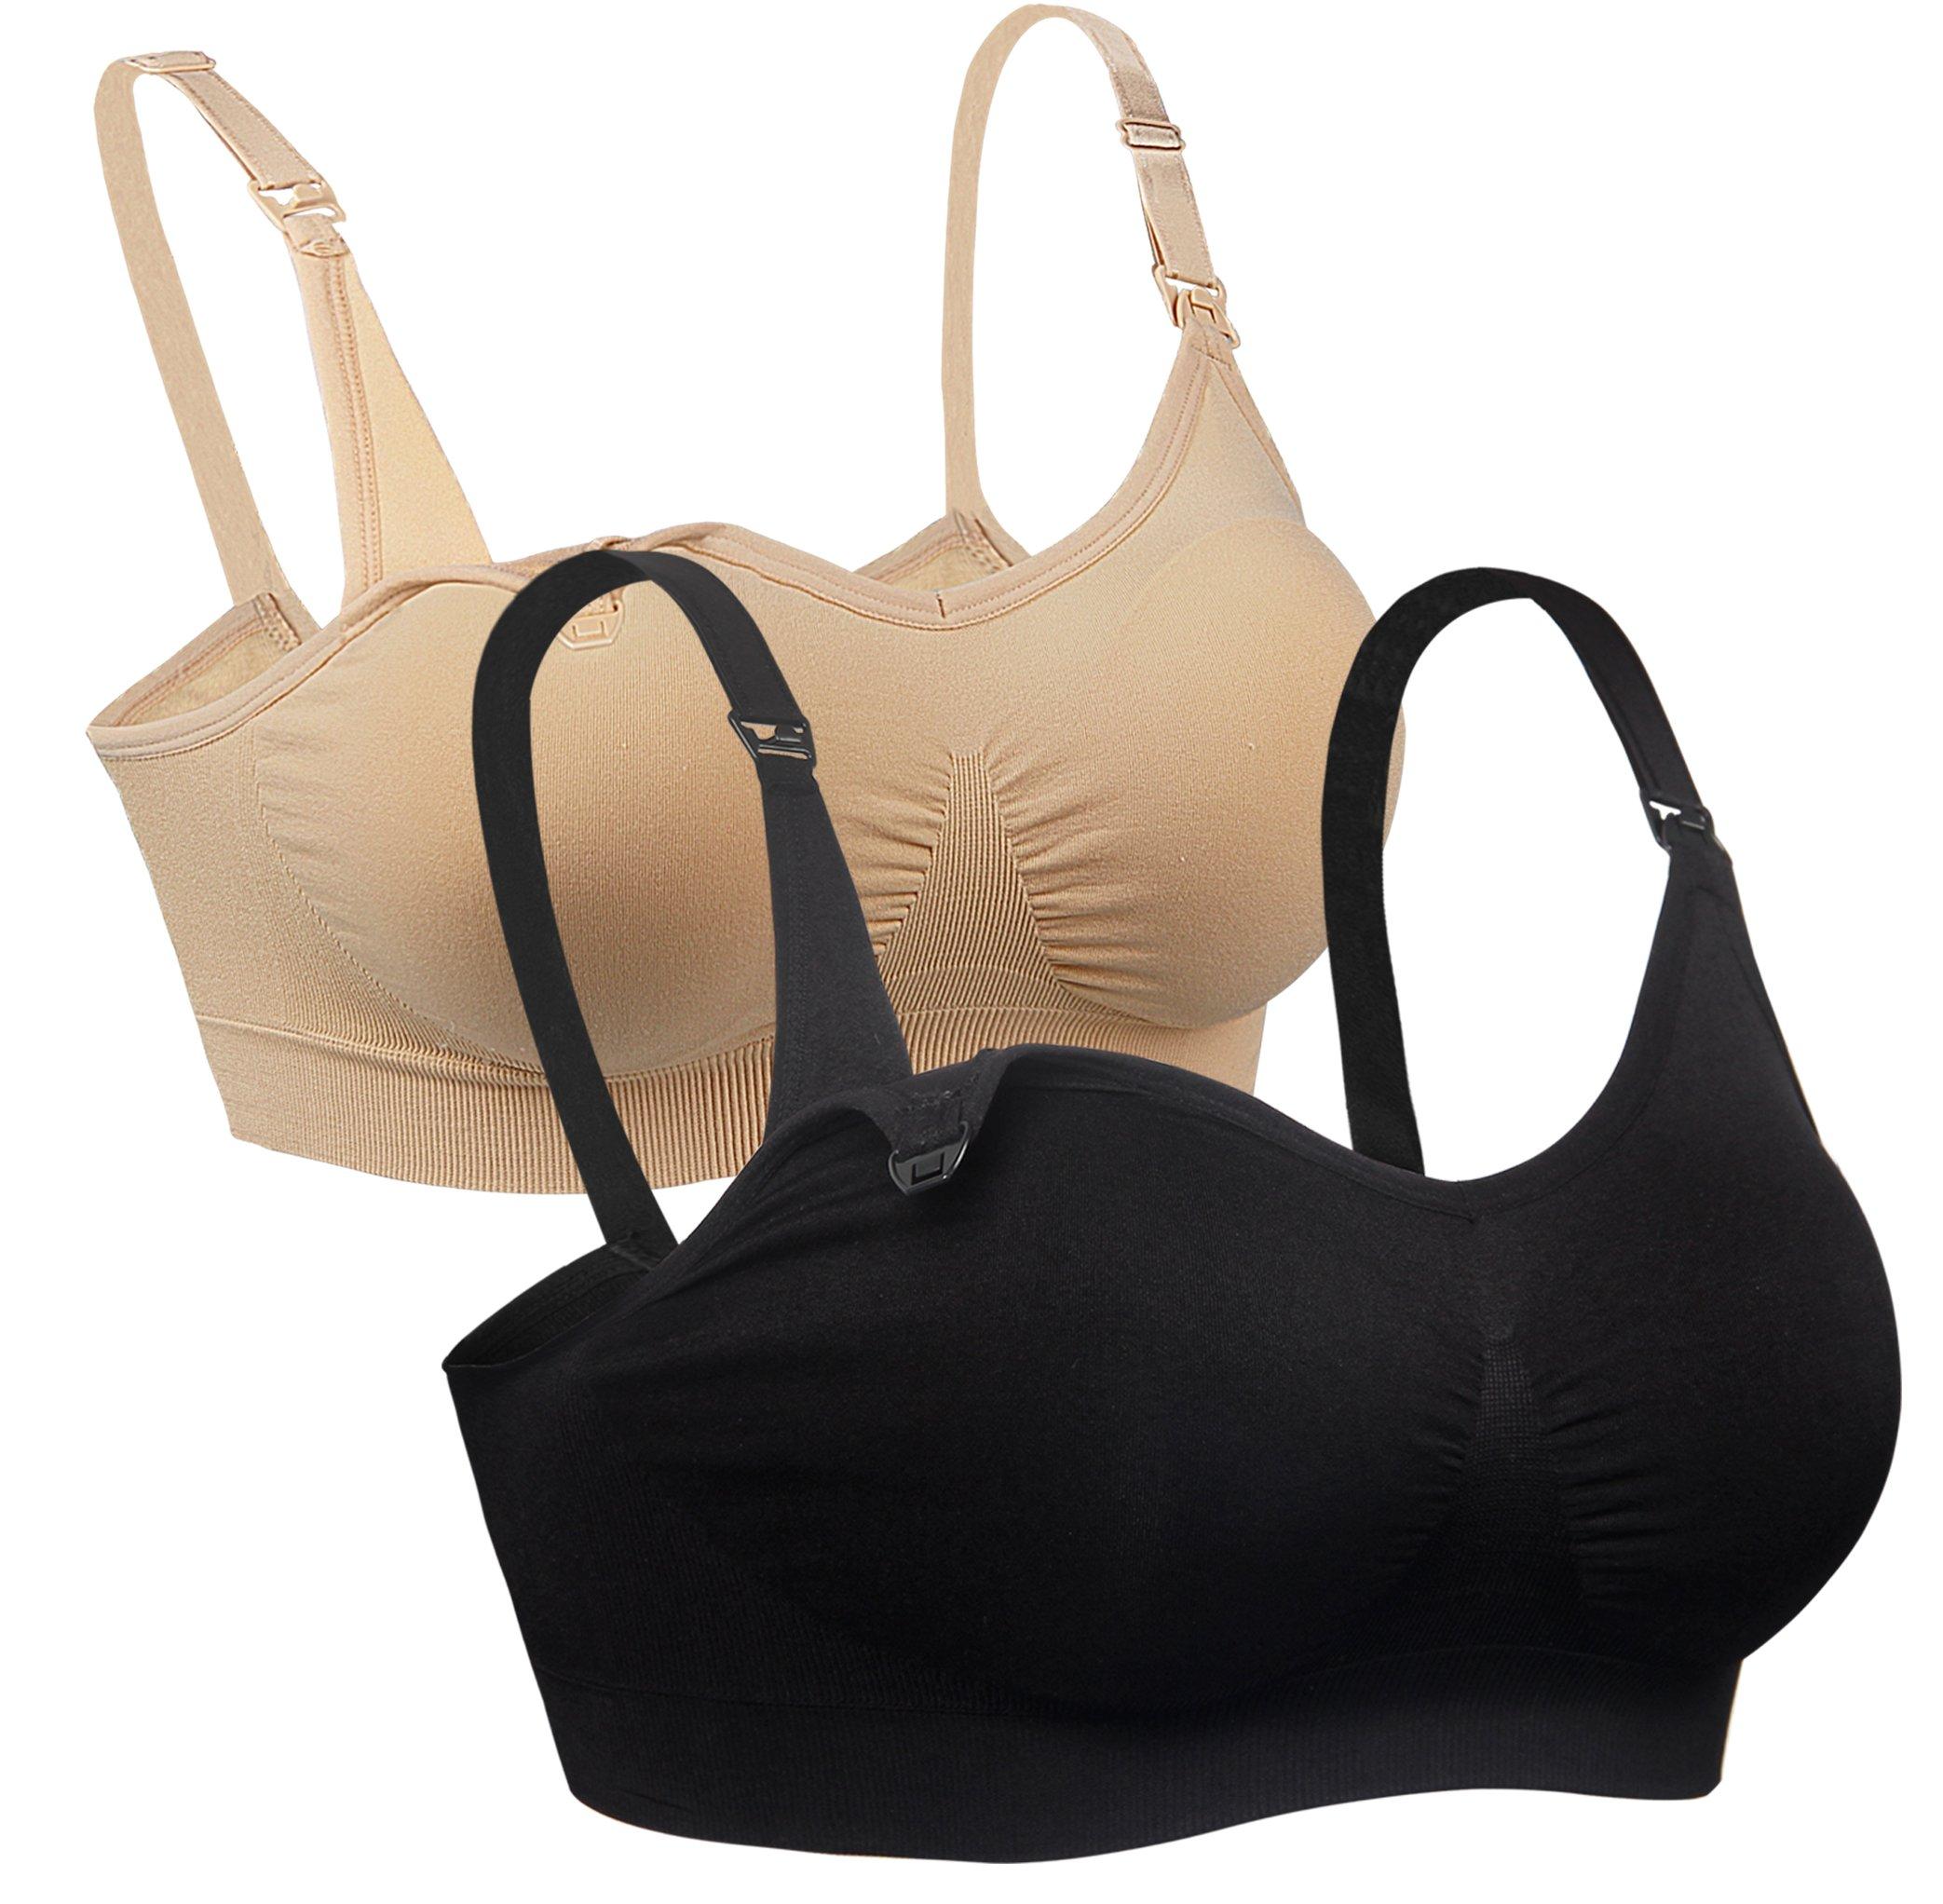 330e813addba7 iLoveSIA Womens Seamless Nursing Bra Sleep Maternity Bralette Pack of 2  product image